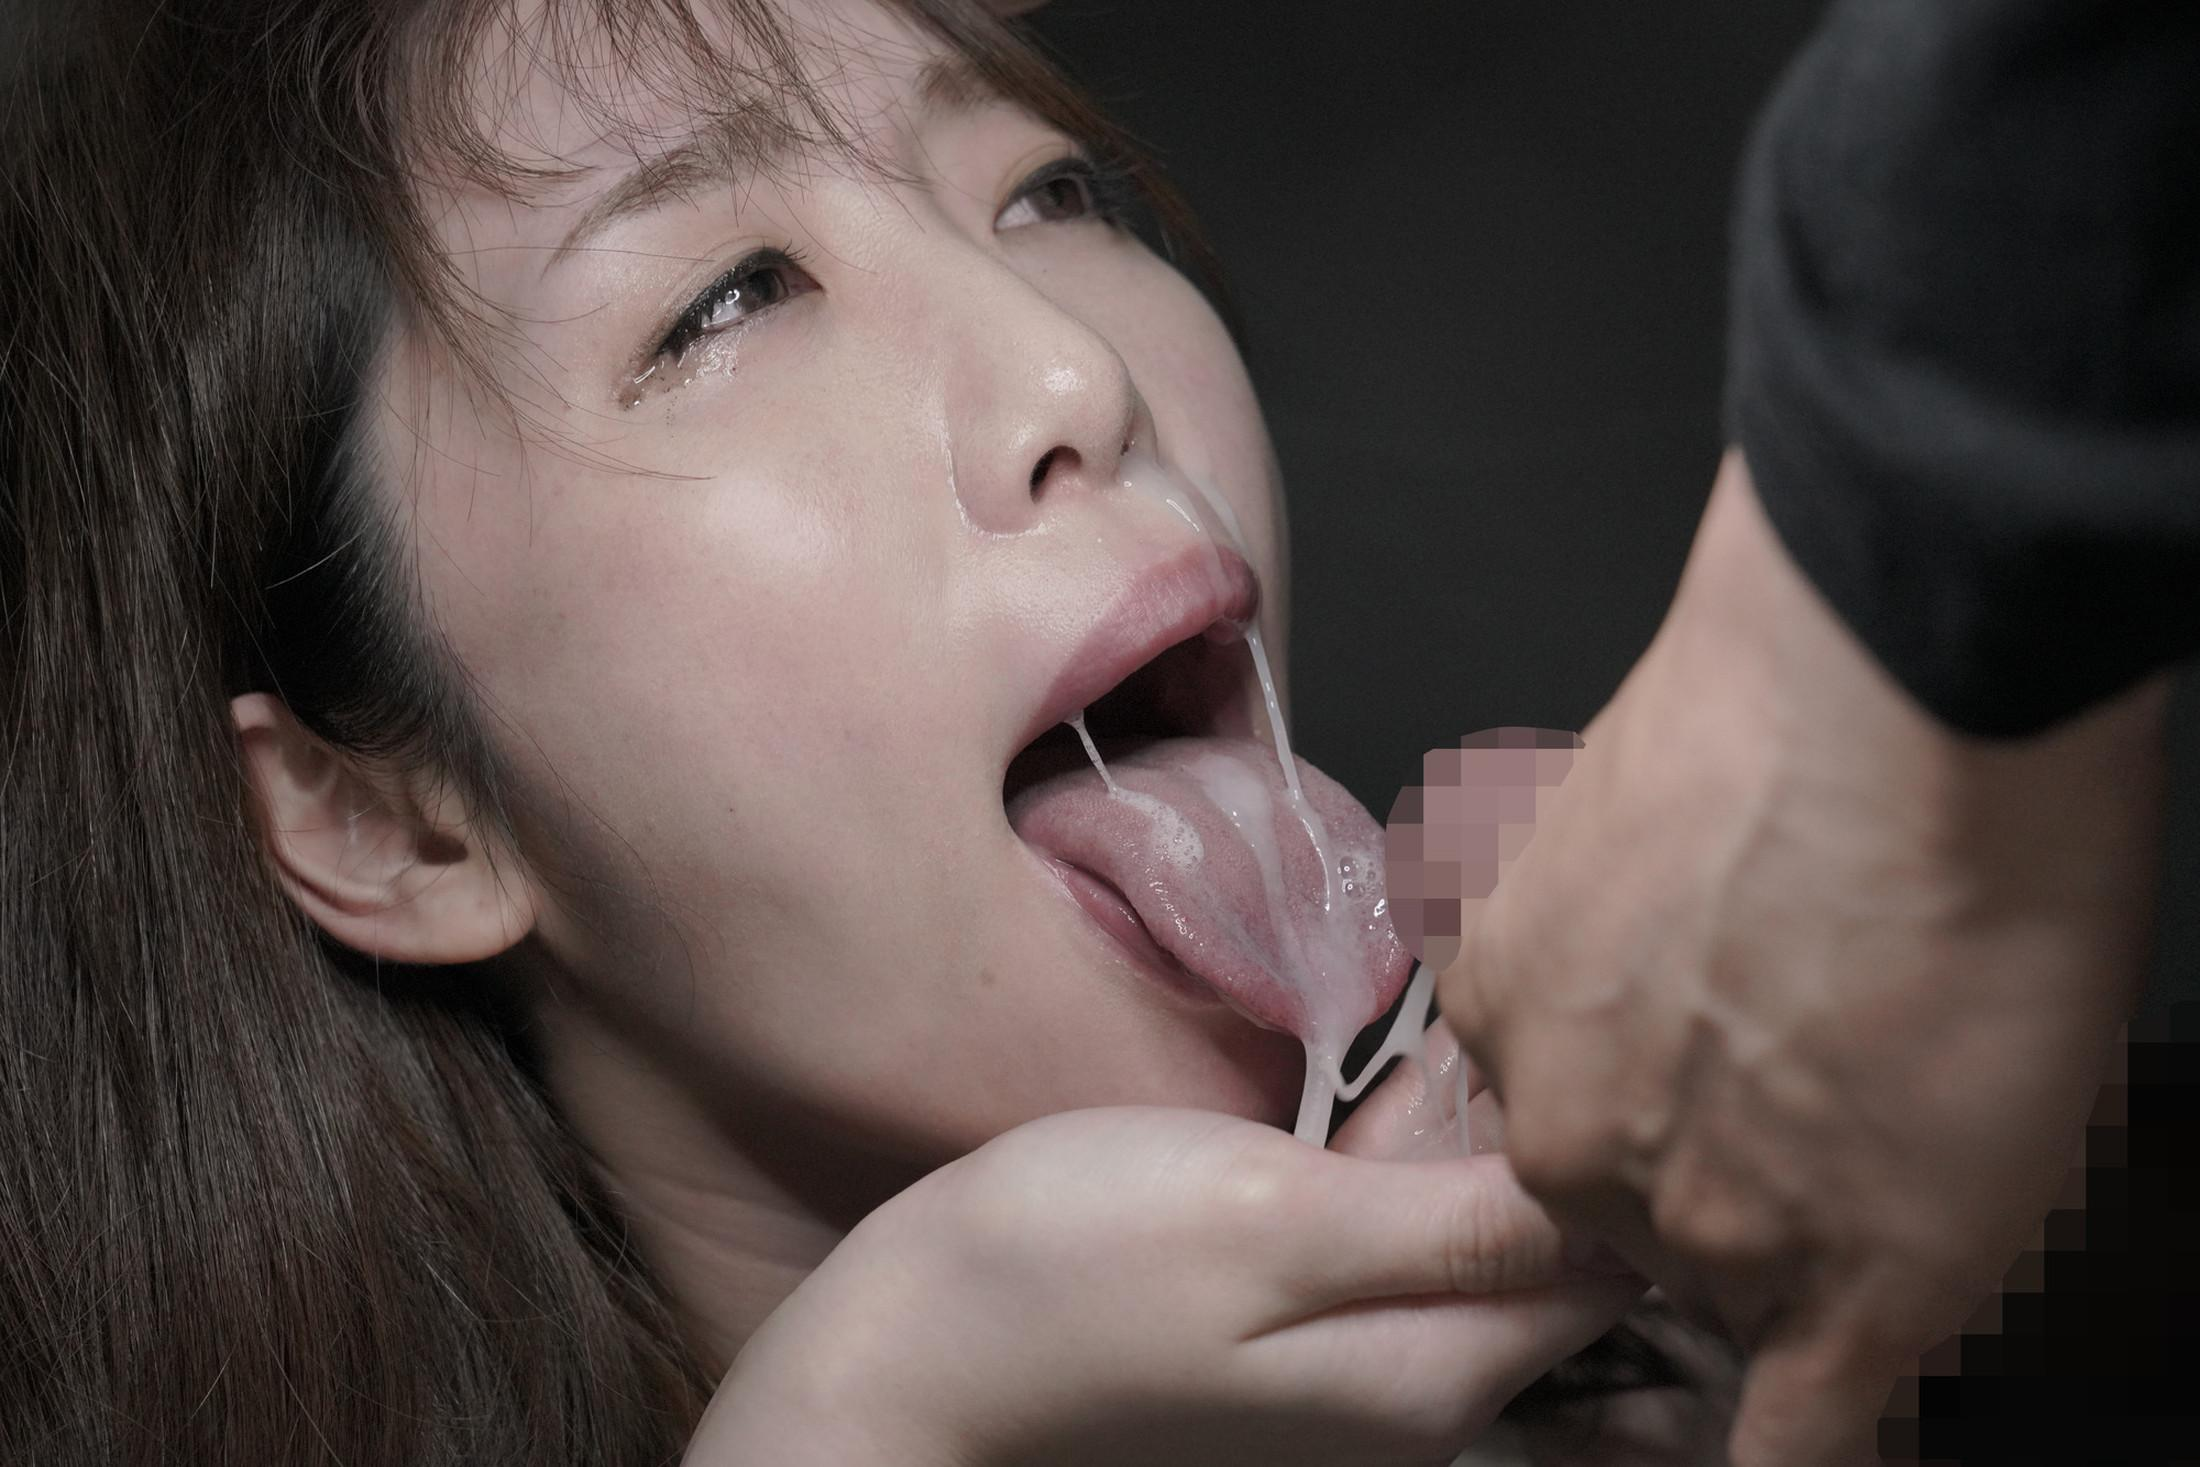 MILF [Haruna] [Maki Sakashita] [Center village mature vieos compilation] 69 Porn Pics (21 Mar. 20)